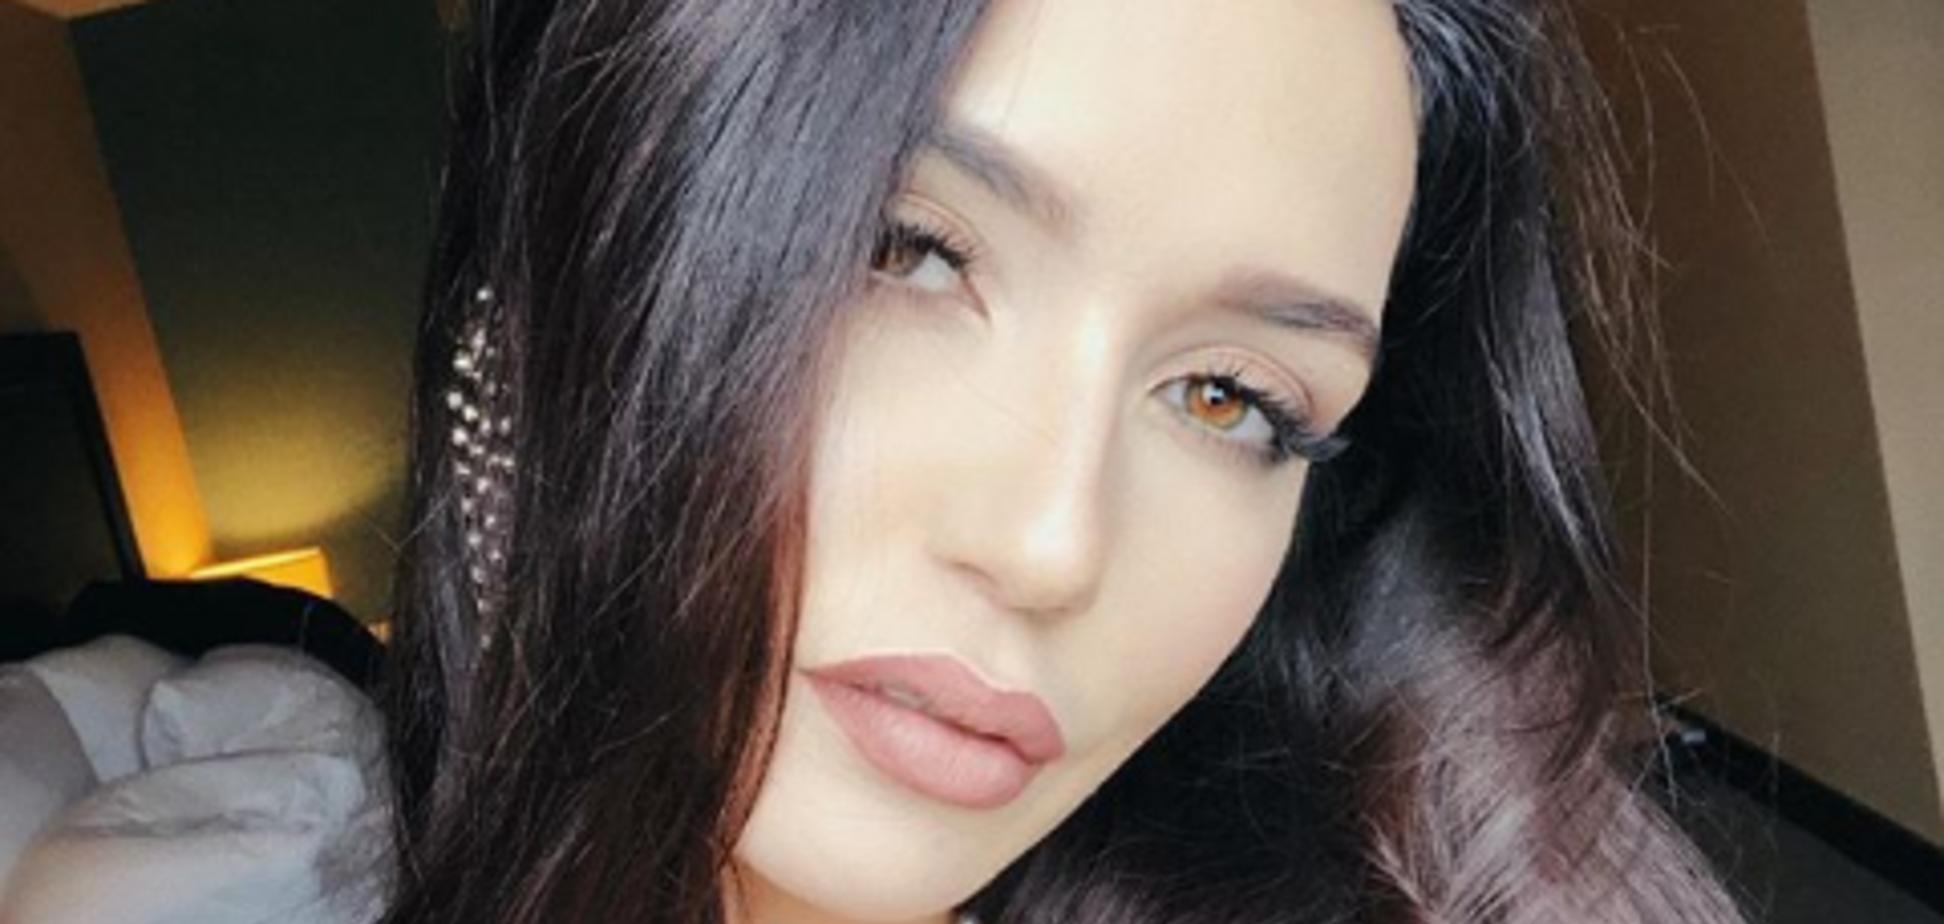 'Королева спокуси!' Співачка з РФ сексуально оголила груди